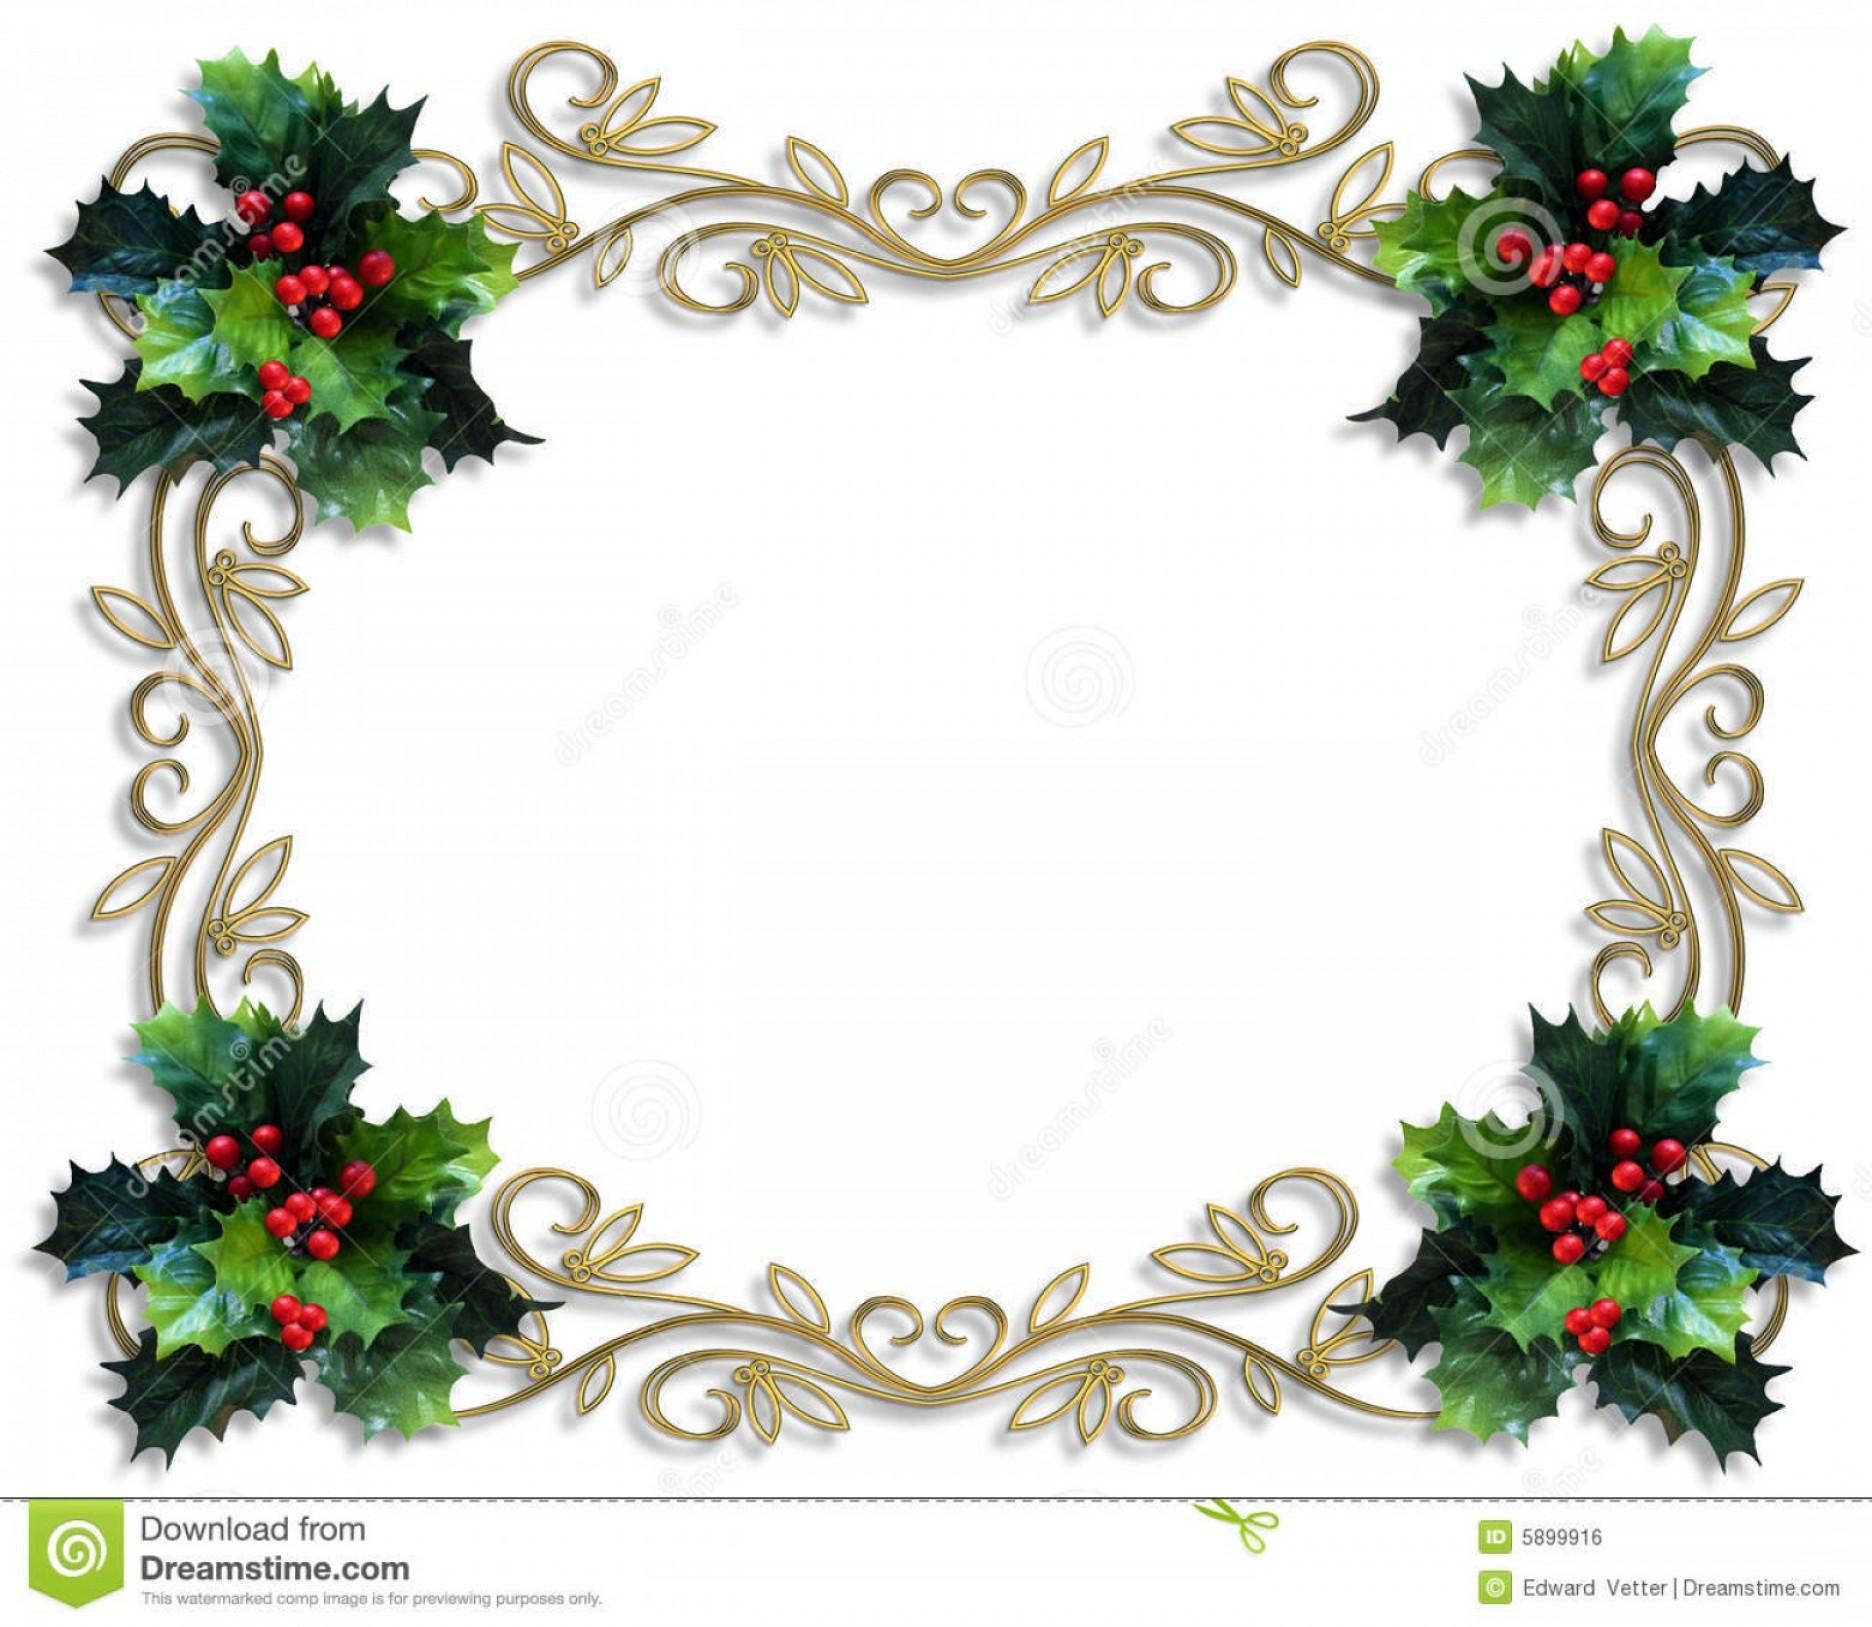 Royalty Free Stock Image Christmas Border Holly Gold Frame Image.